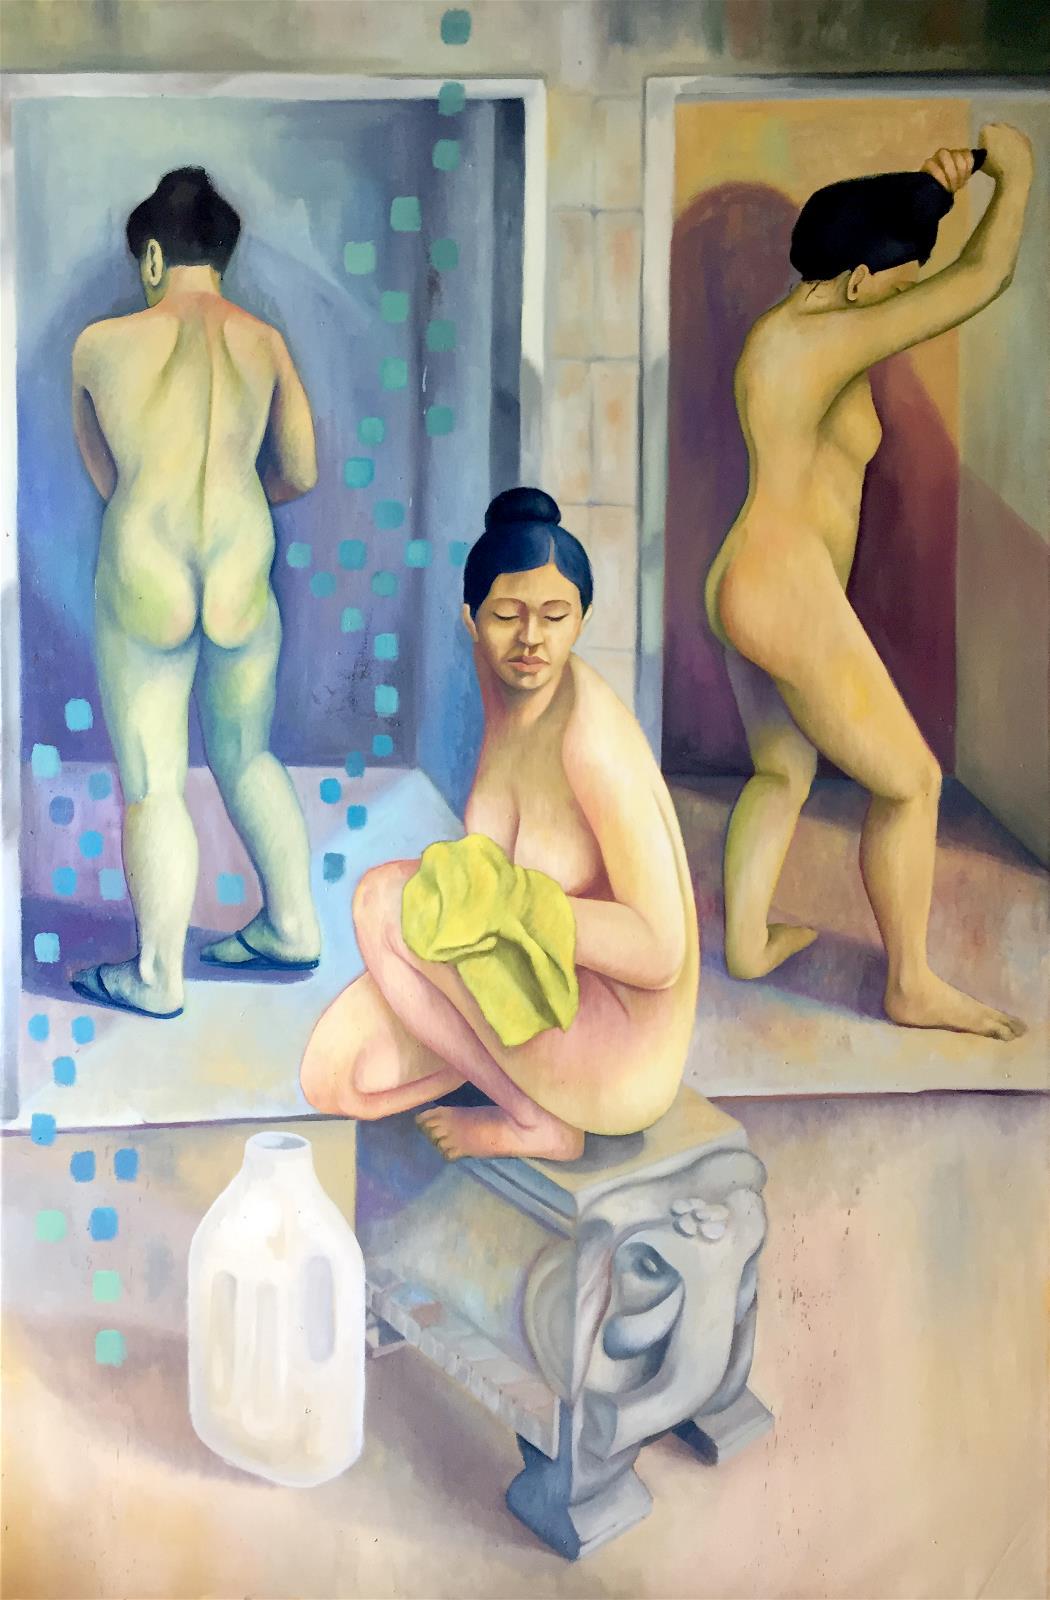 Chinese showers